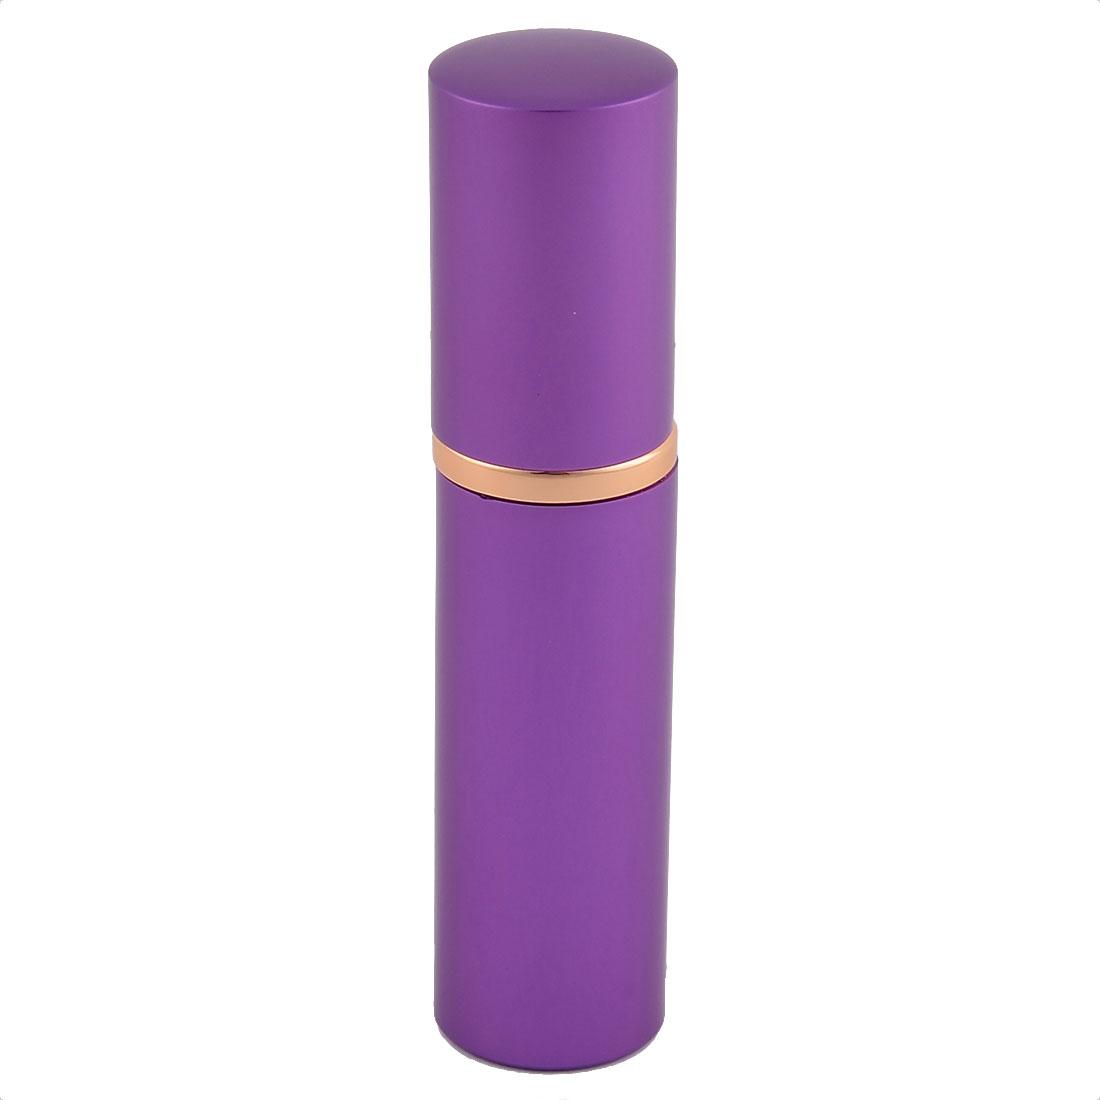 10mL Travel Portable Lipstick Shape Refillable Perfume Spray Bottle Atomizer Purple